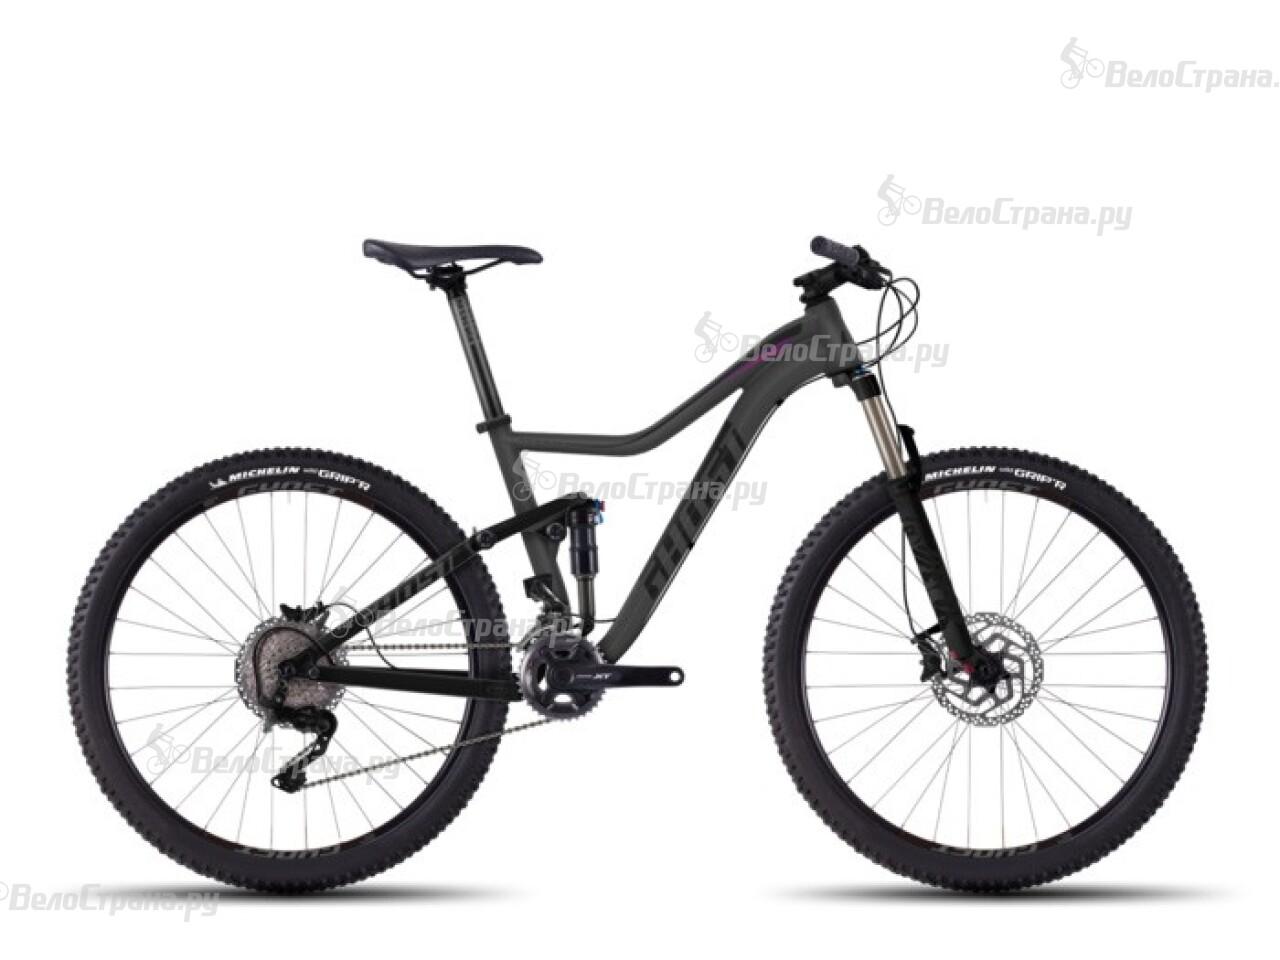 Велосипед Ghost Lanao FS 7 (2016) велосипед challenger mission lux fs 26 черно красный 16